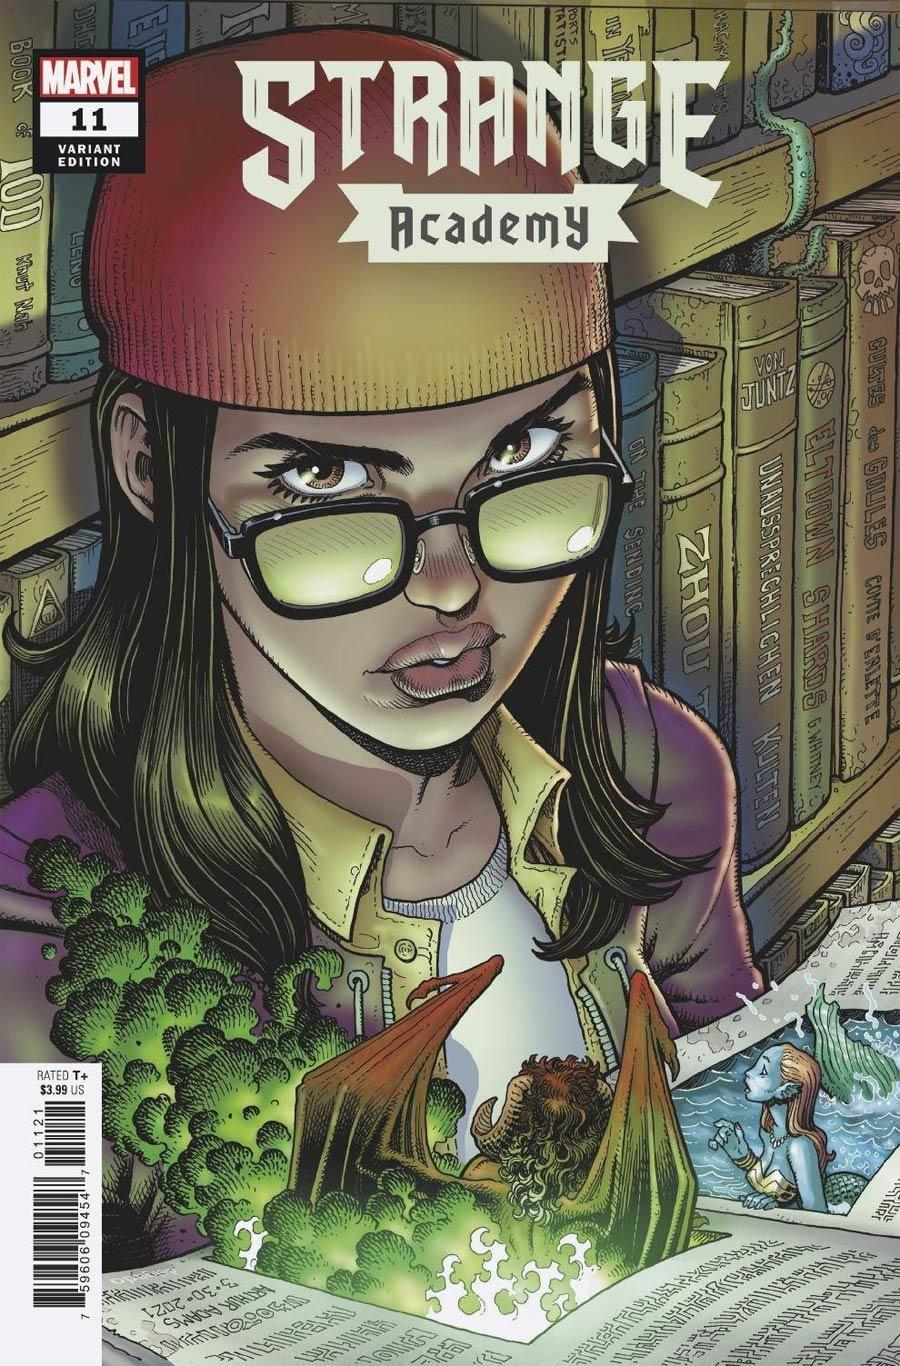 Strange Academy #11 Cover B Variant Arthur Adams Character Spotlight Cover